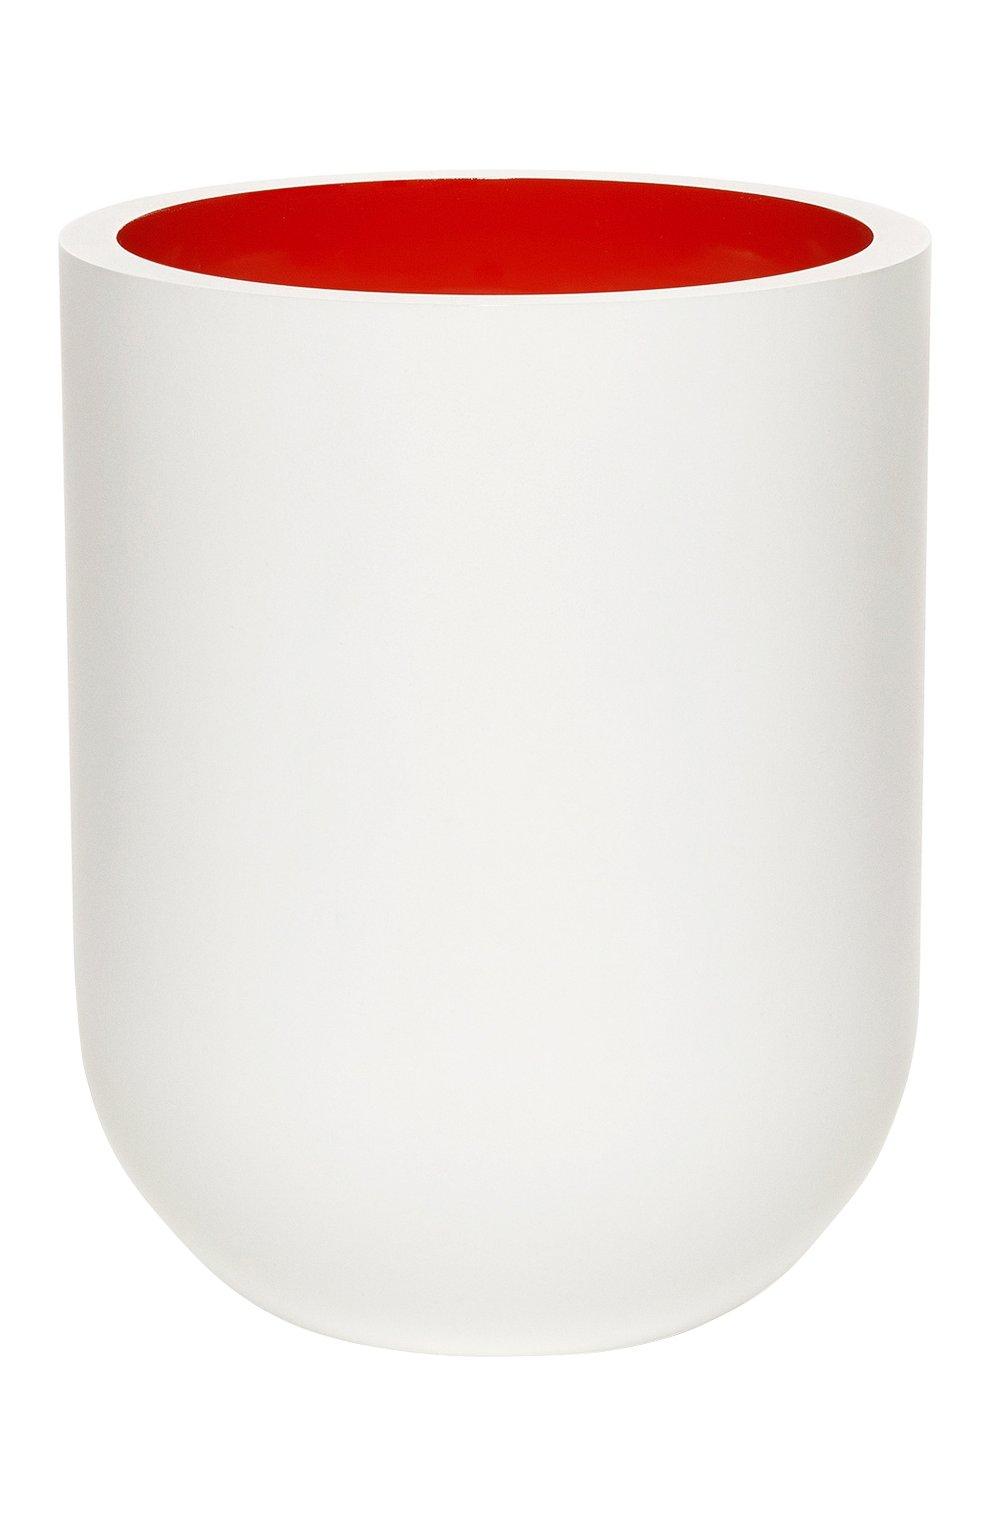 Мужская парфюмерная свеча russian nights FREDERIC MALLE бесцветного цвета, арт. 3700135094079 | Фото 1